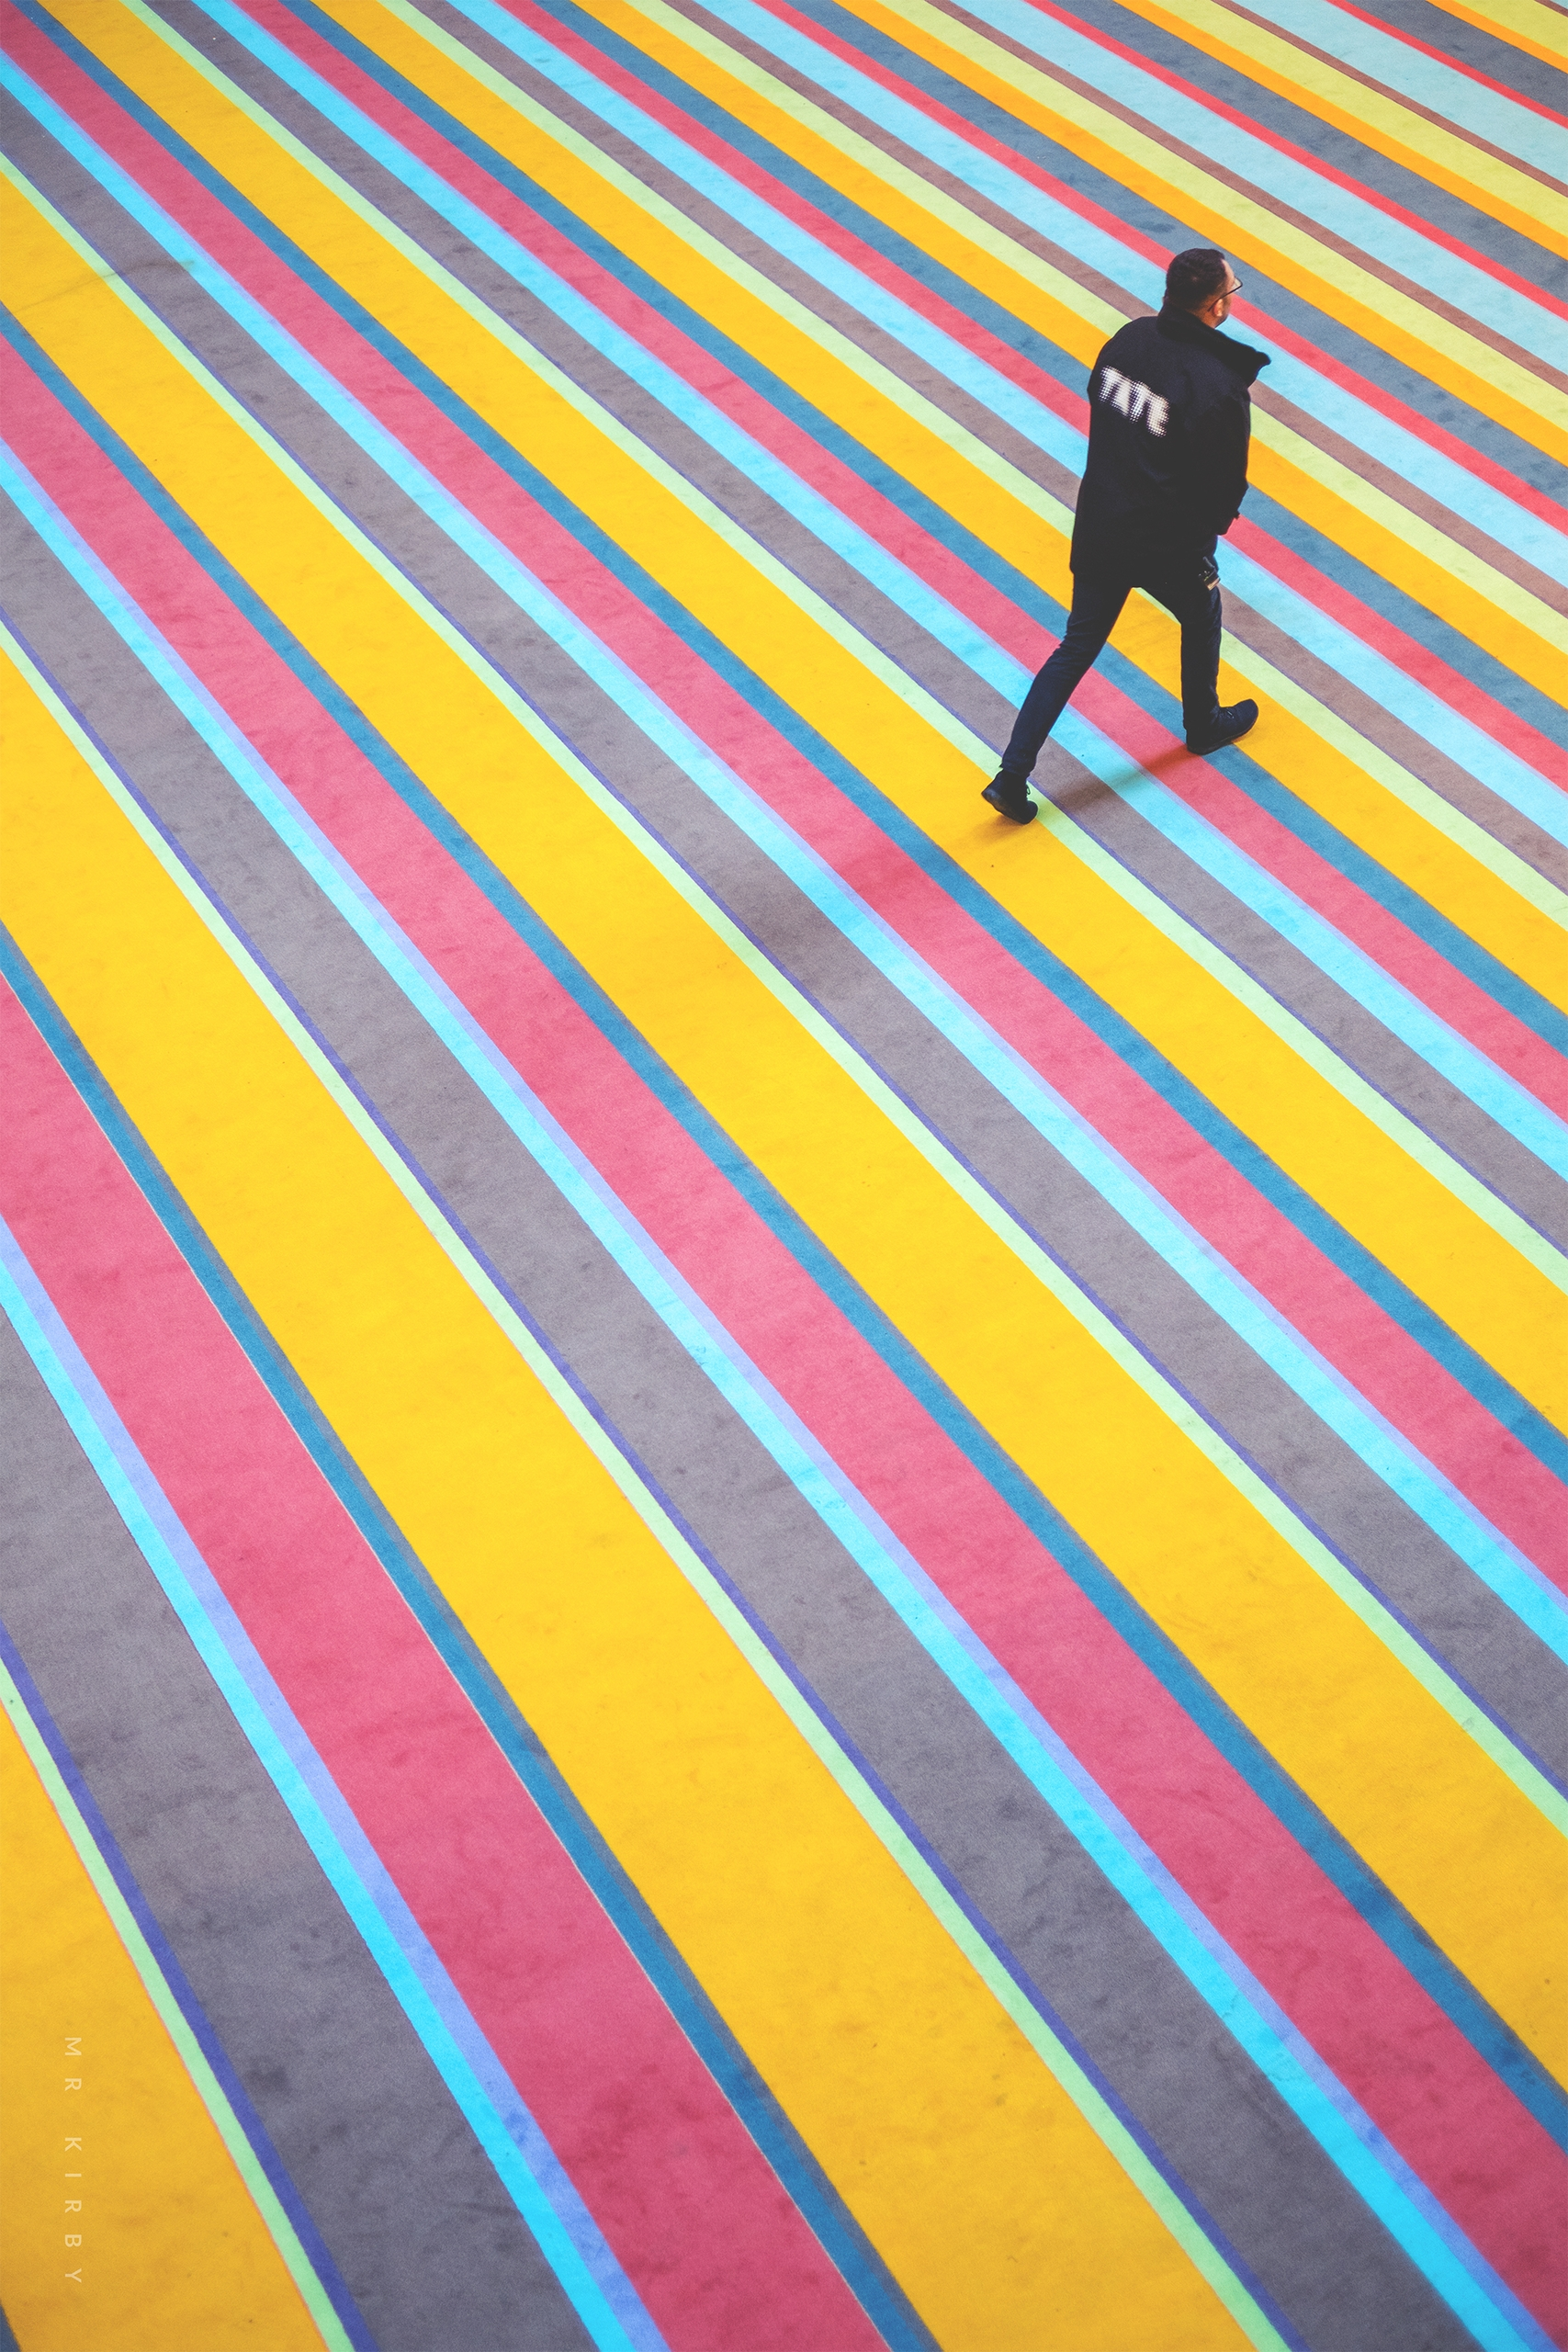 Tate Carpet - fujifilm, streetphotography - mrkirby | ello